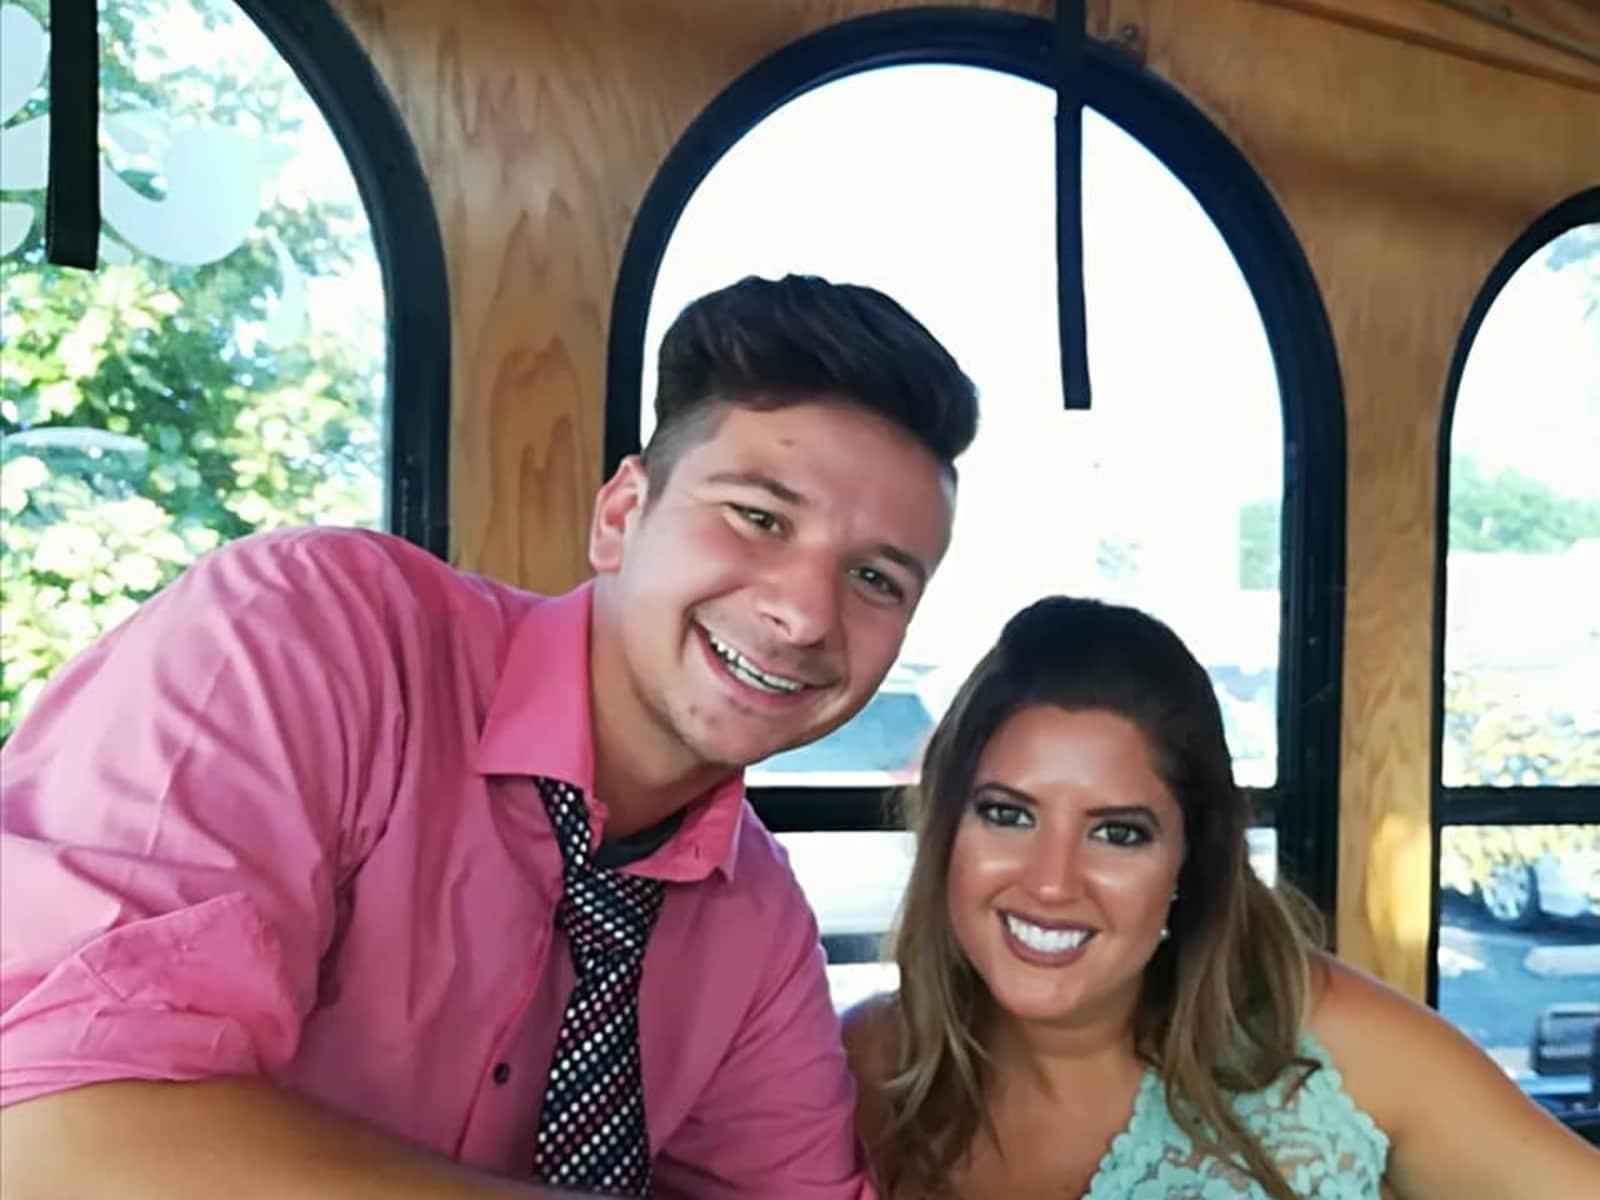 Katie & Jacob from St. Louis, Missouri, United States